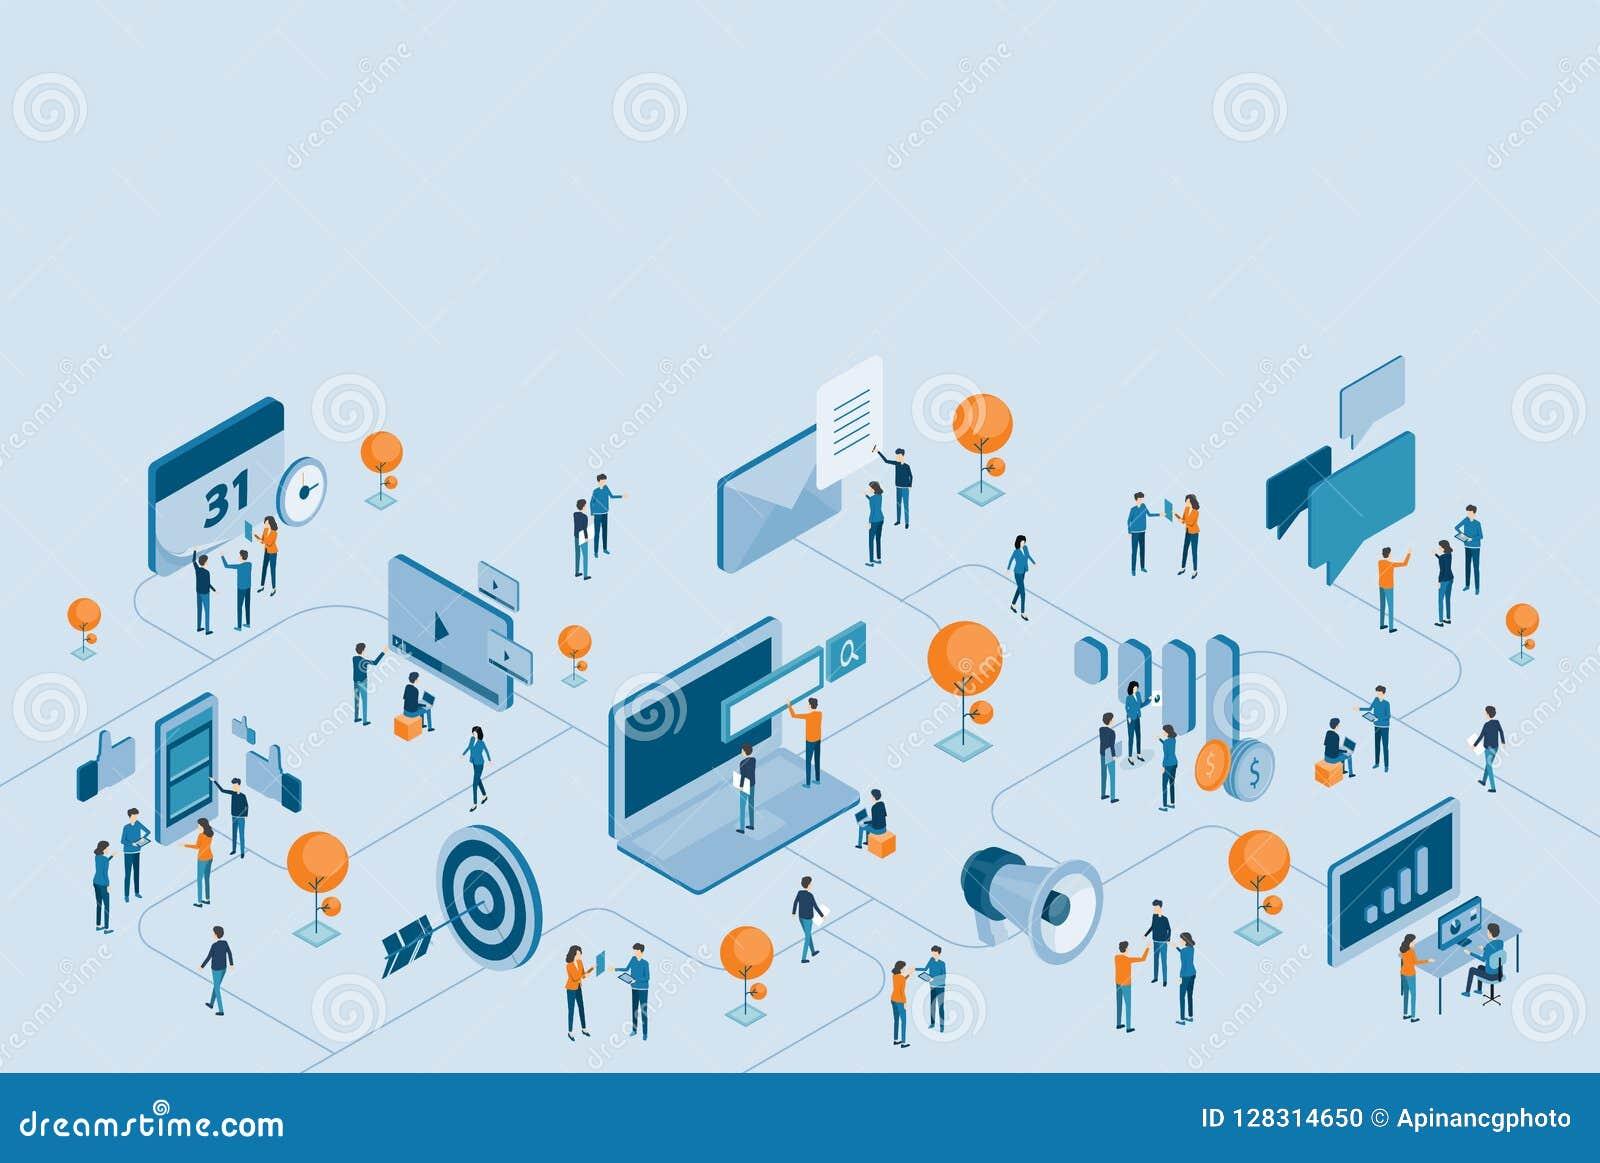 Isometric σχέδιο για σε απευθείας σύνδεση σύνδεση επιχειρησιακού την ψηφιακή μάρκετινγκ